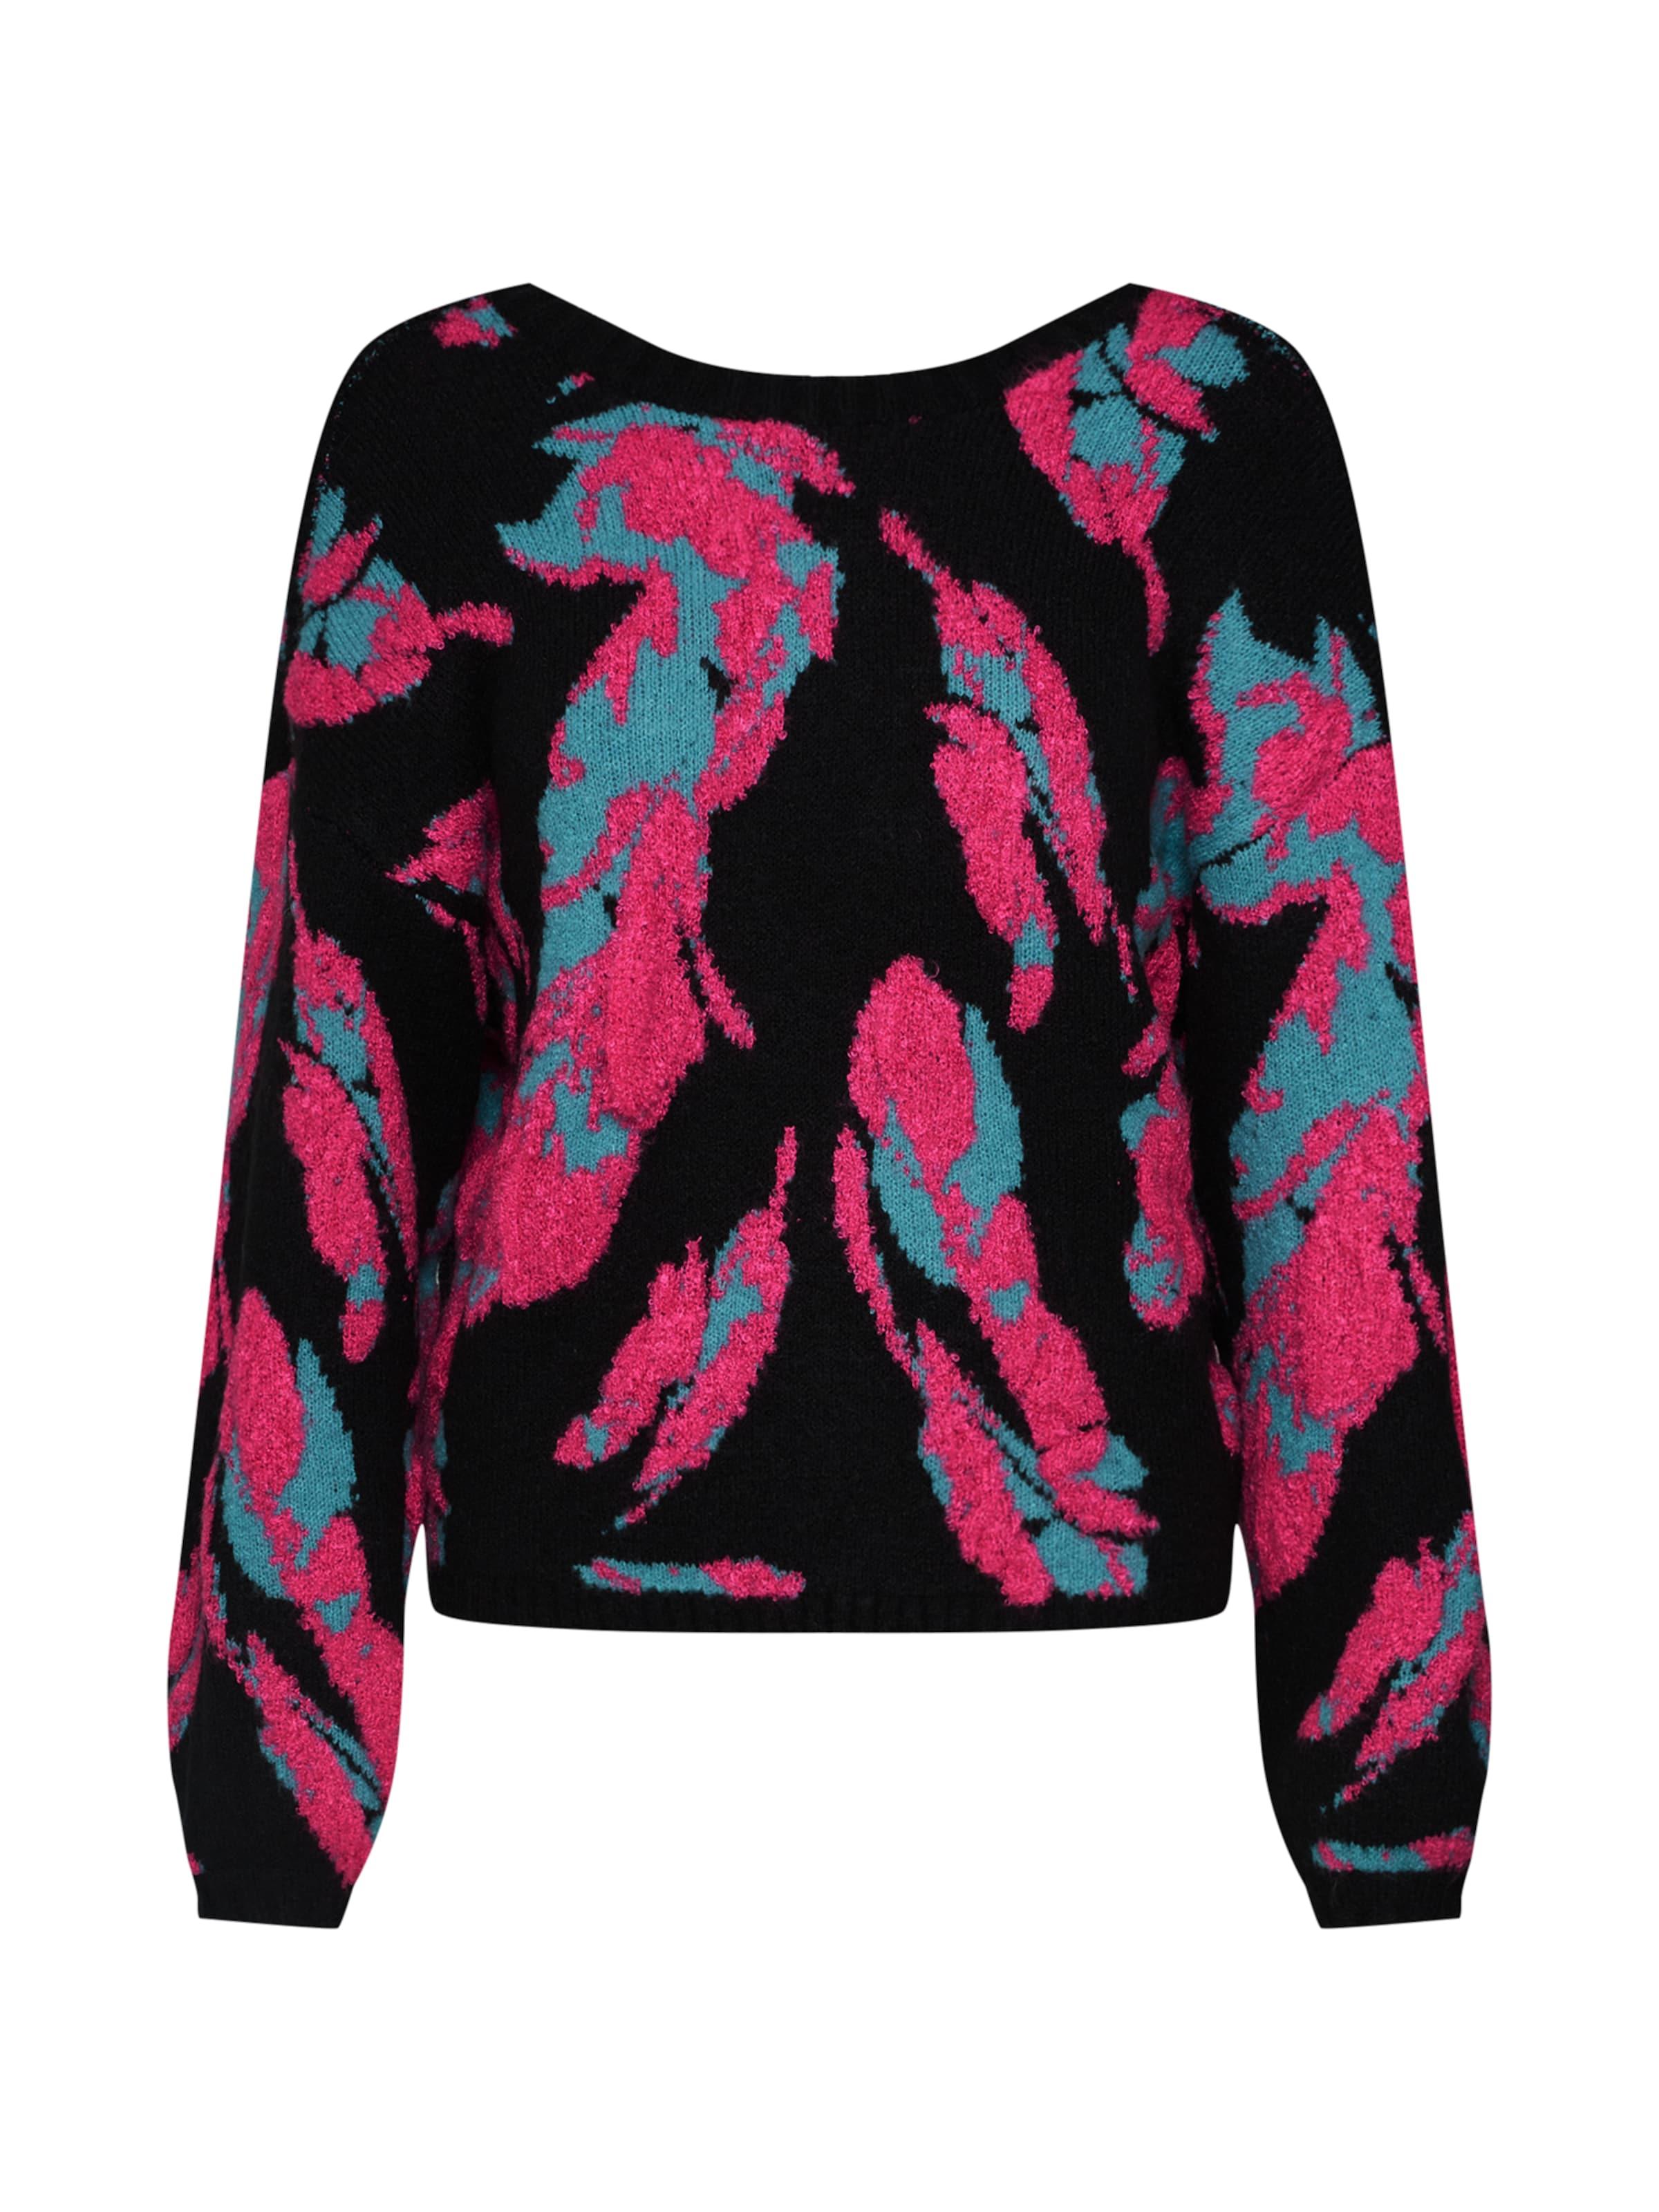 Lost Pullover In 'intarsia' Ink PinkSchwarz VSqMpUz